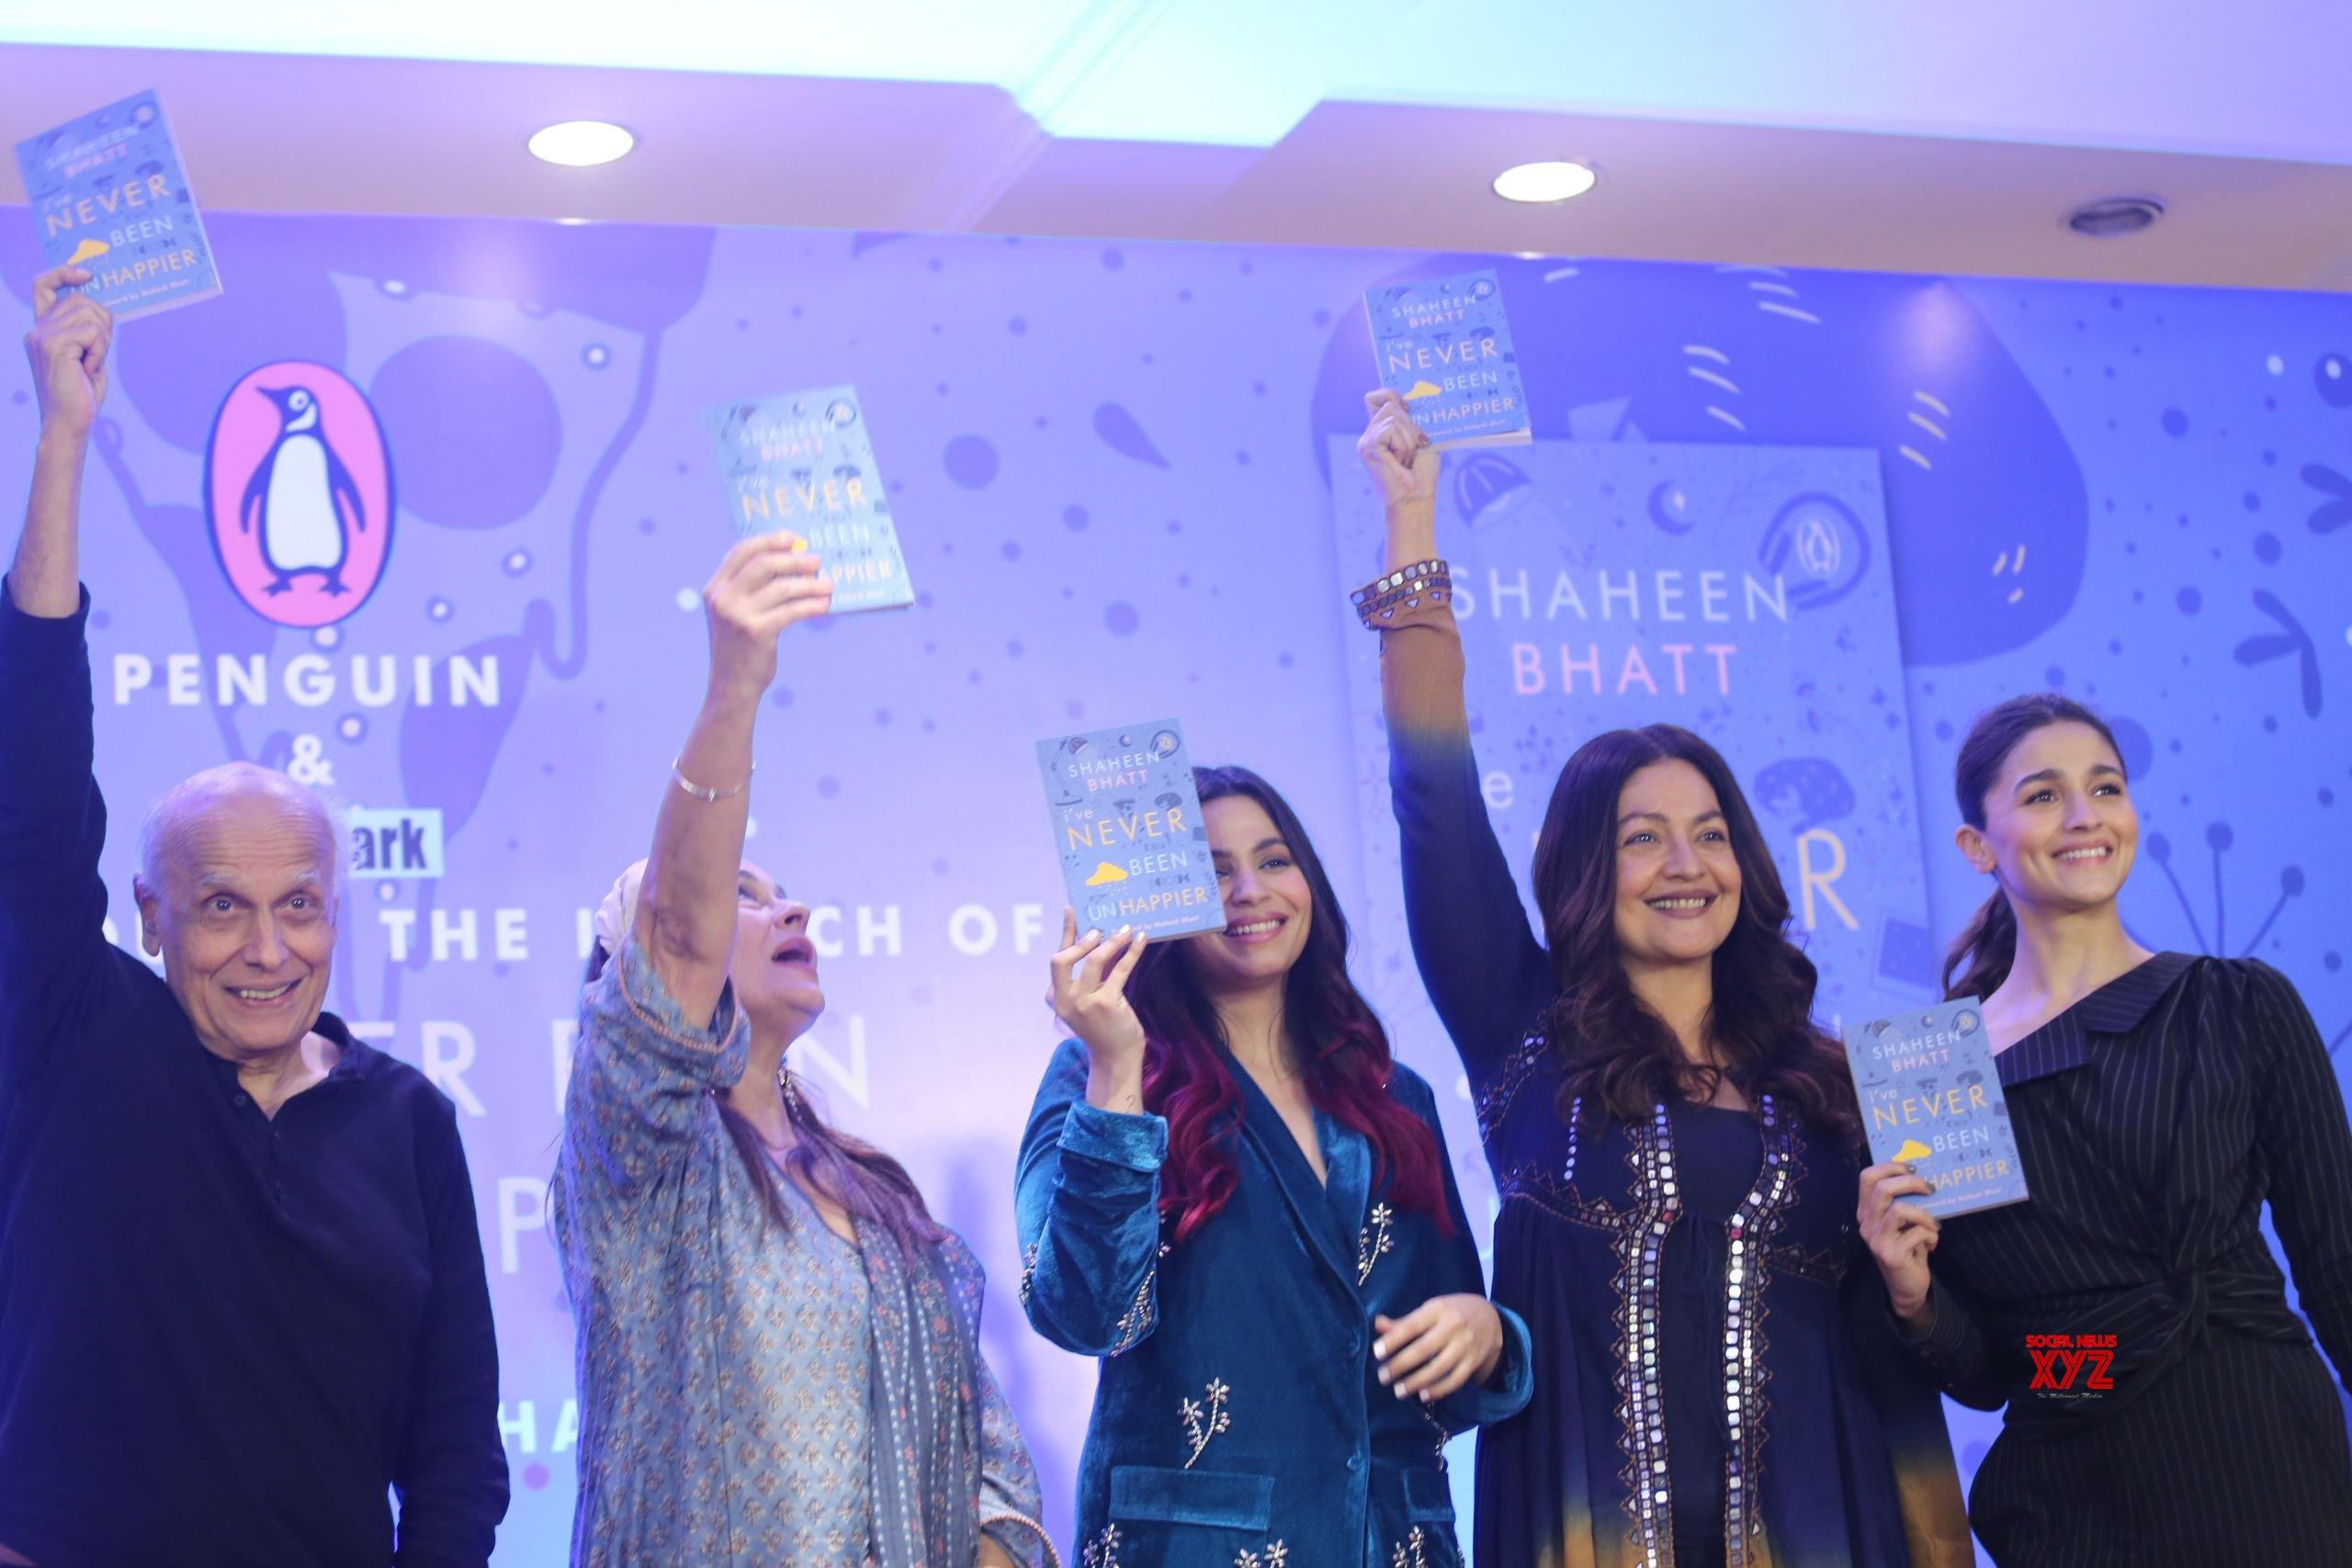 Alia Bhatt And Family At Shaheen Bhatt's Book Launch At Taj Lands End Bandra Gallery